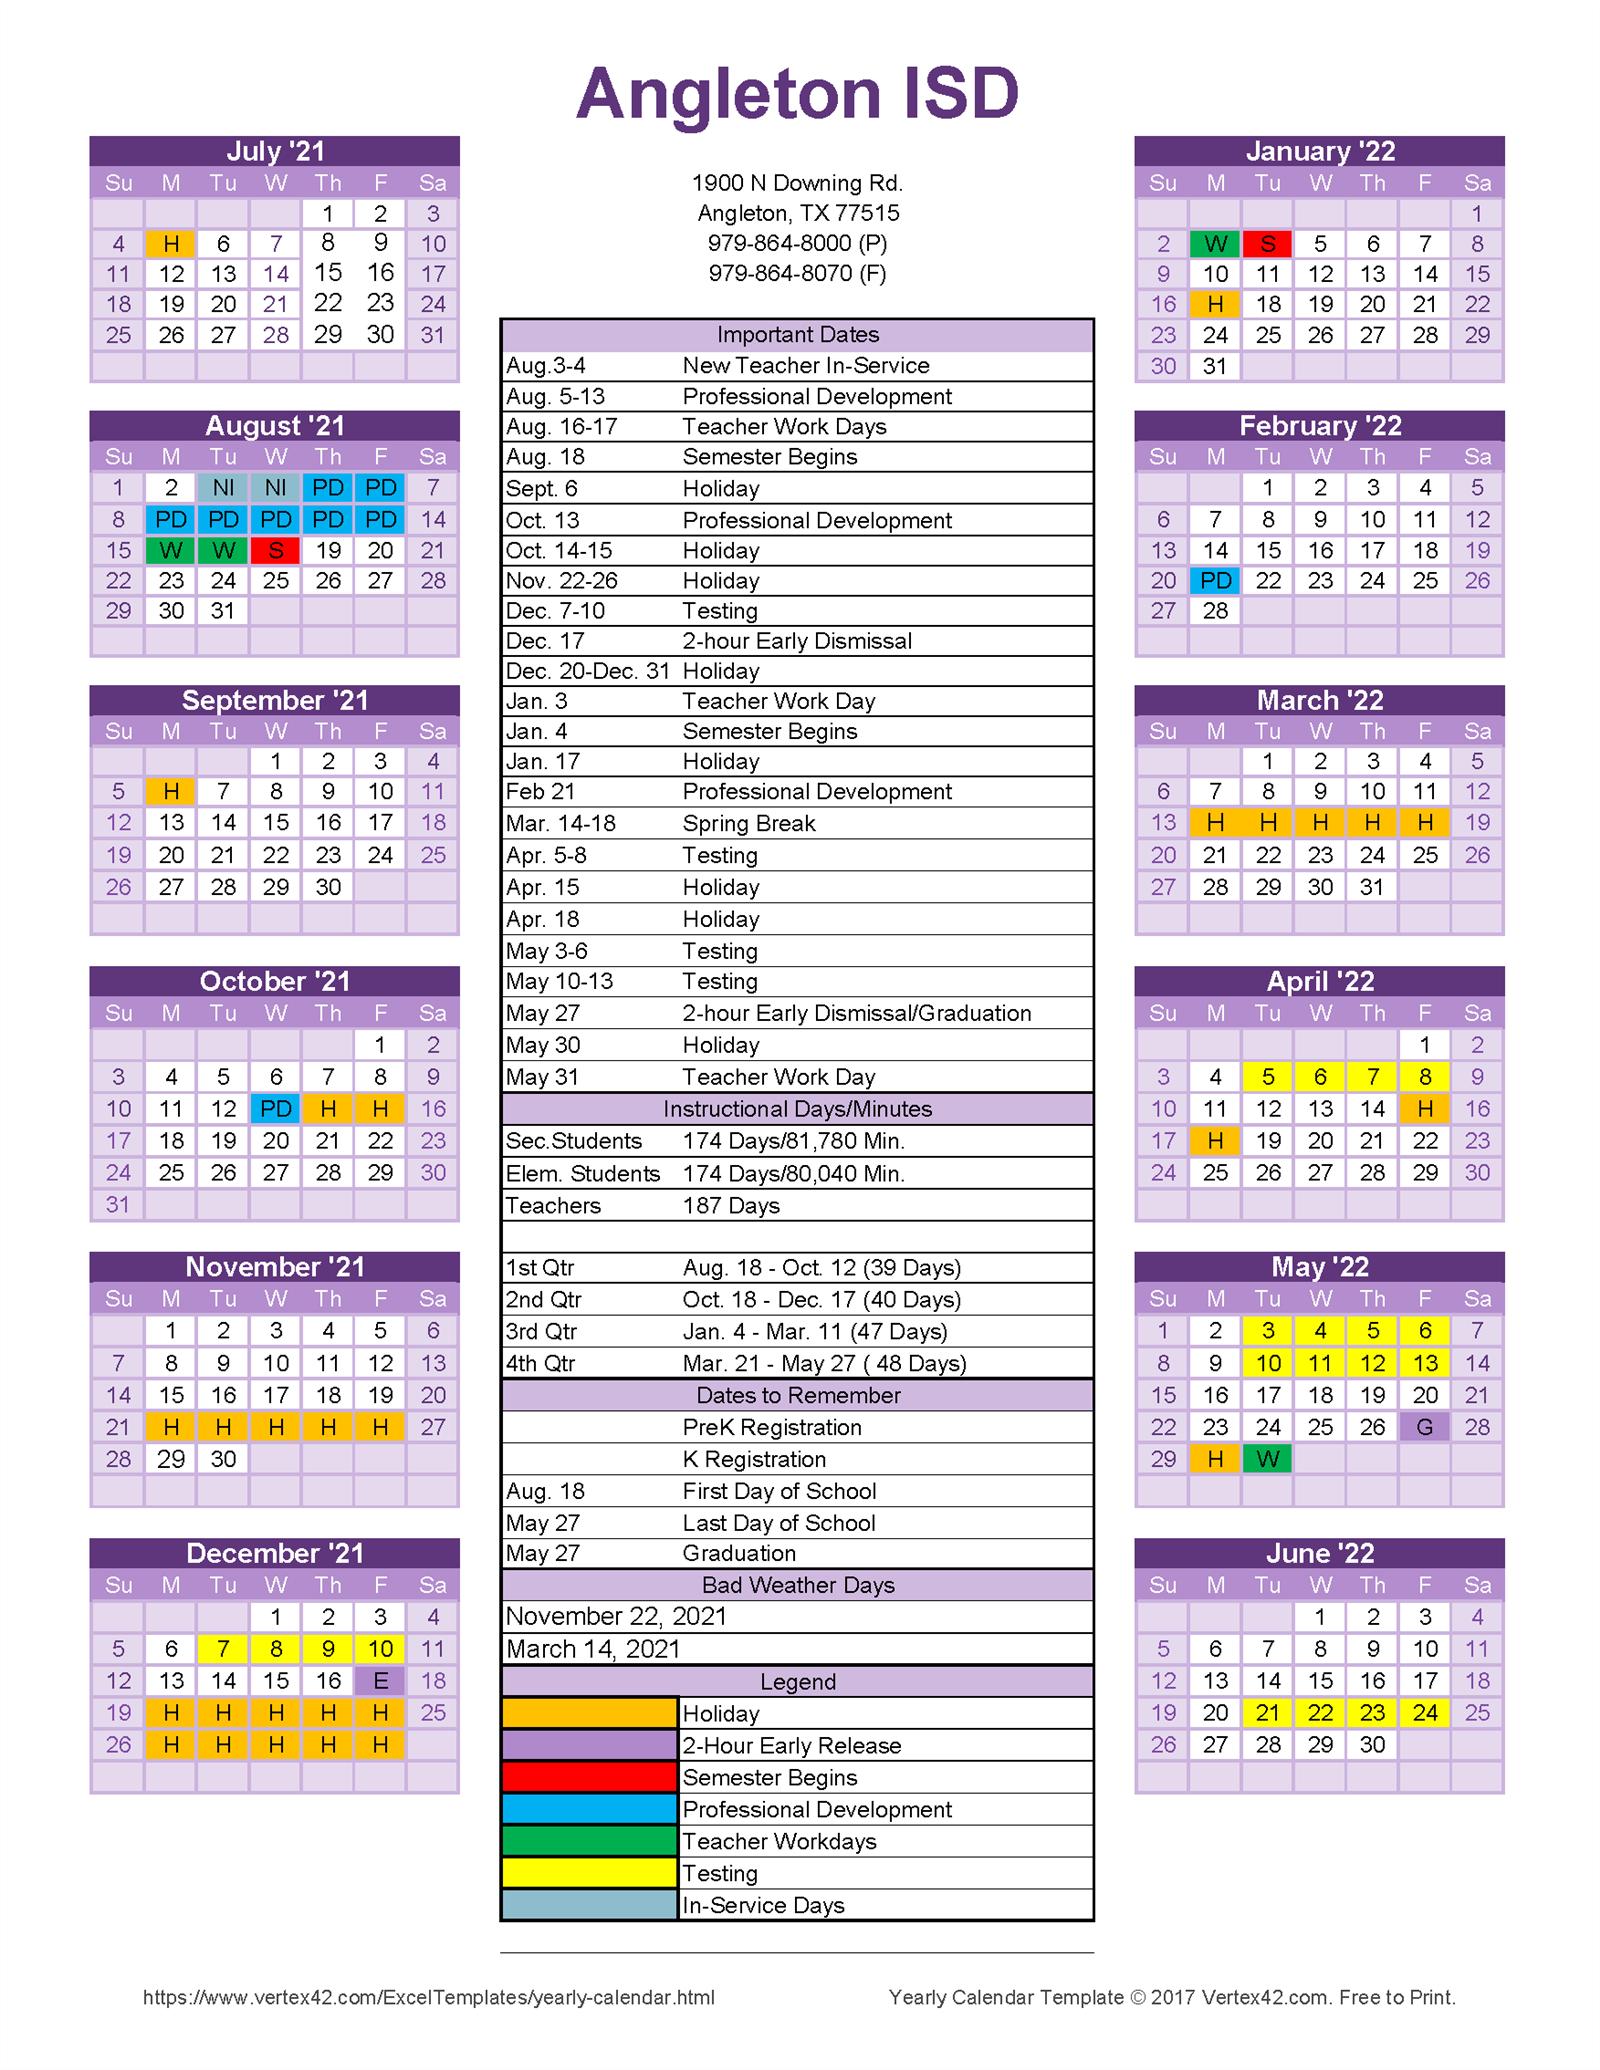 Pace Academic Calendar 2022.F Ibqnl4hlr7hm